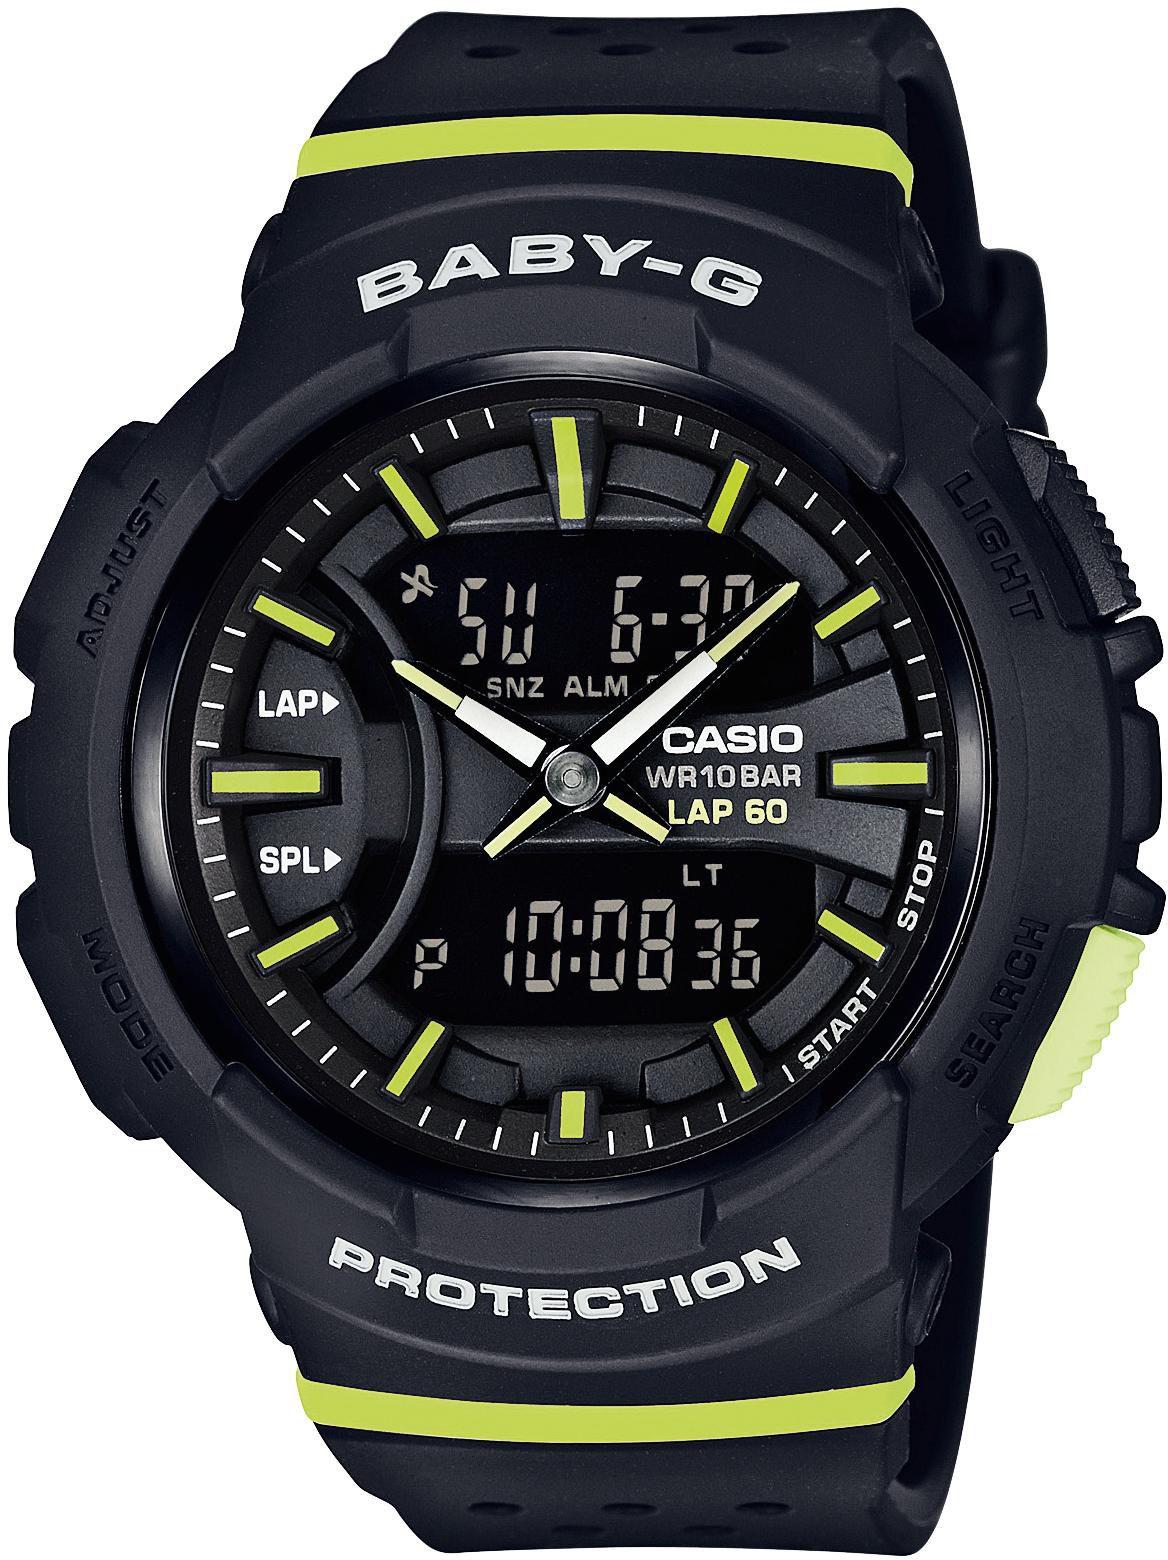 CASIO BABY G Casio Baby-G Chronograph »BGA-240-1A2ER«